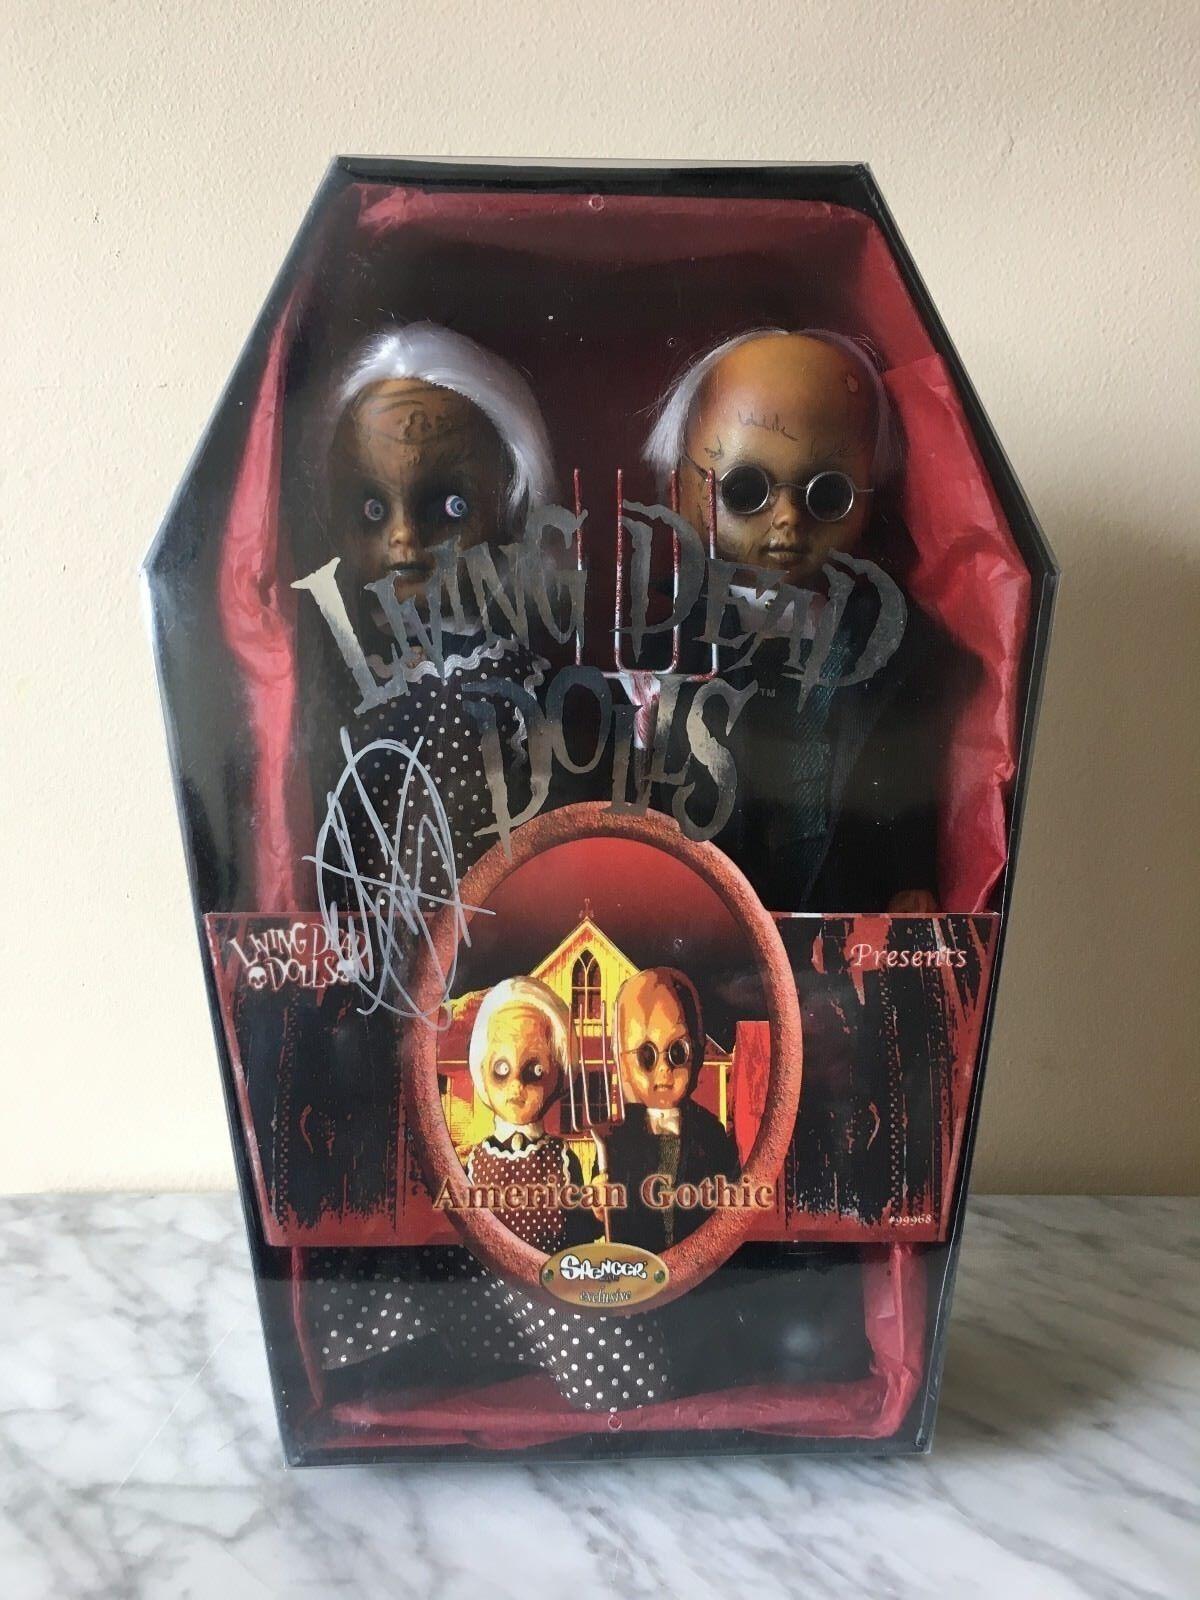 Living Dead Dolls American Gothic Ed largo firmado  Spencer's Exclusivo   Sellado